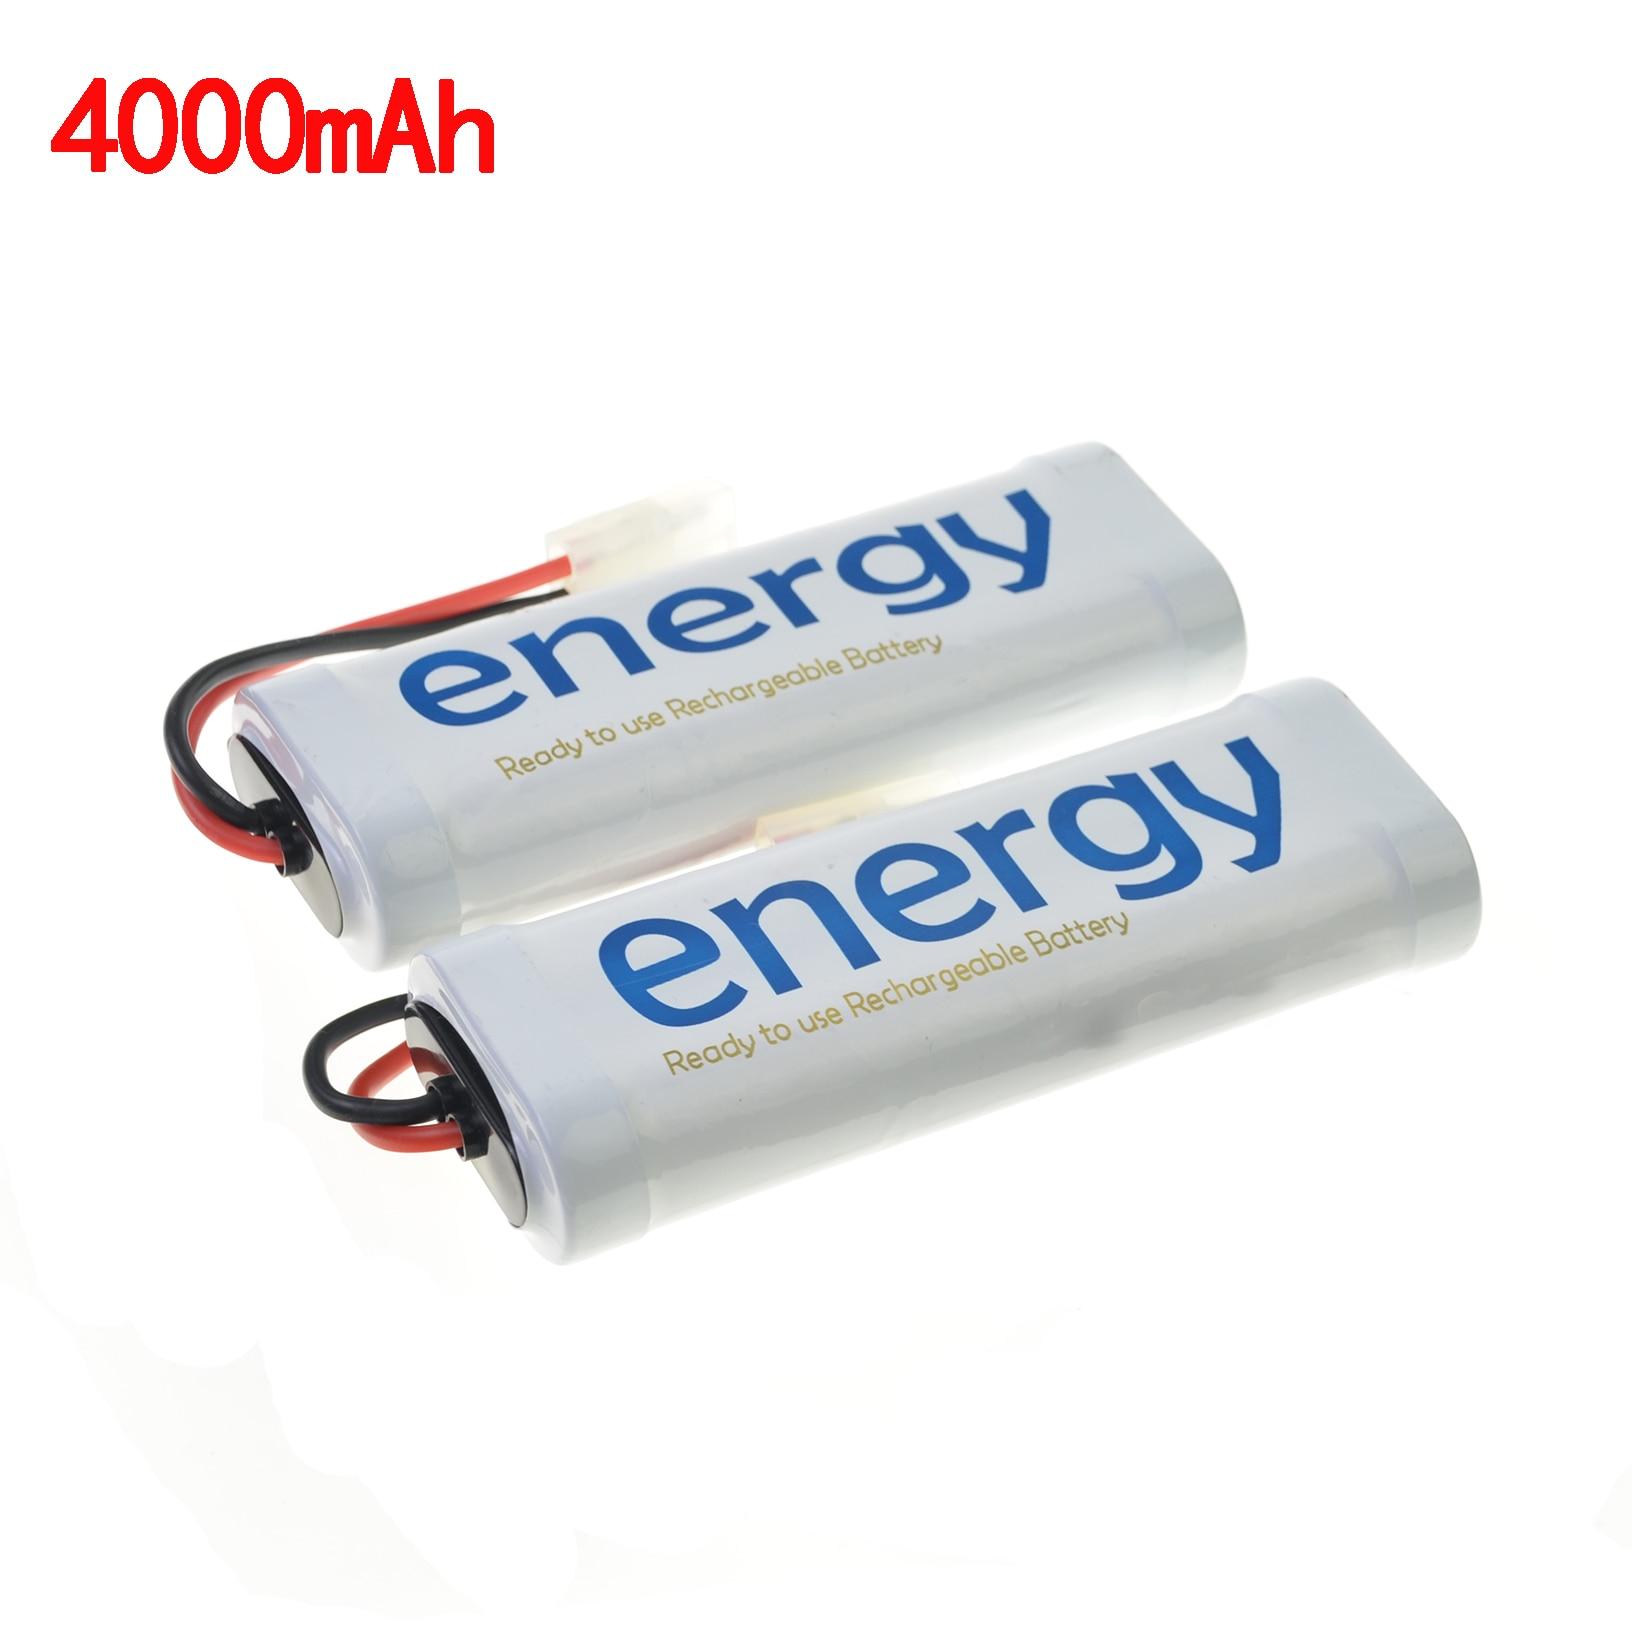 2/3/4/5/pcs RC 7.2V 4000mAh NiMh Plug energy Tamiya 2x white rechargeable battery cige a6510 10 1 inch android 6 0 tablet pc octa core 4gb ram 32gb 64gb rom gps 1280 800 ips 3g tablets 10 phone call dual sim